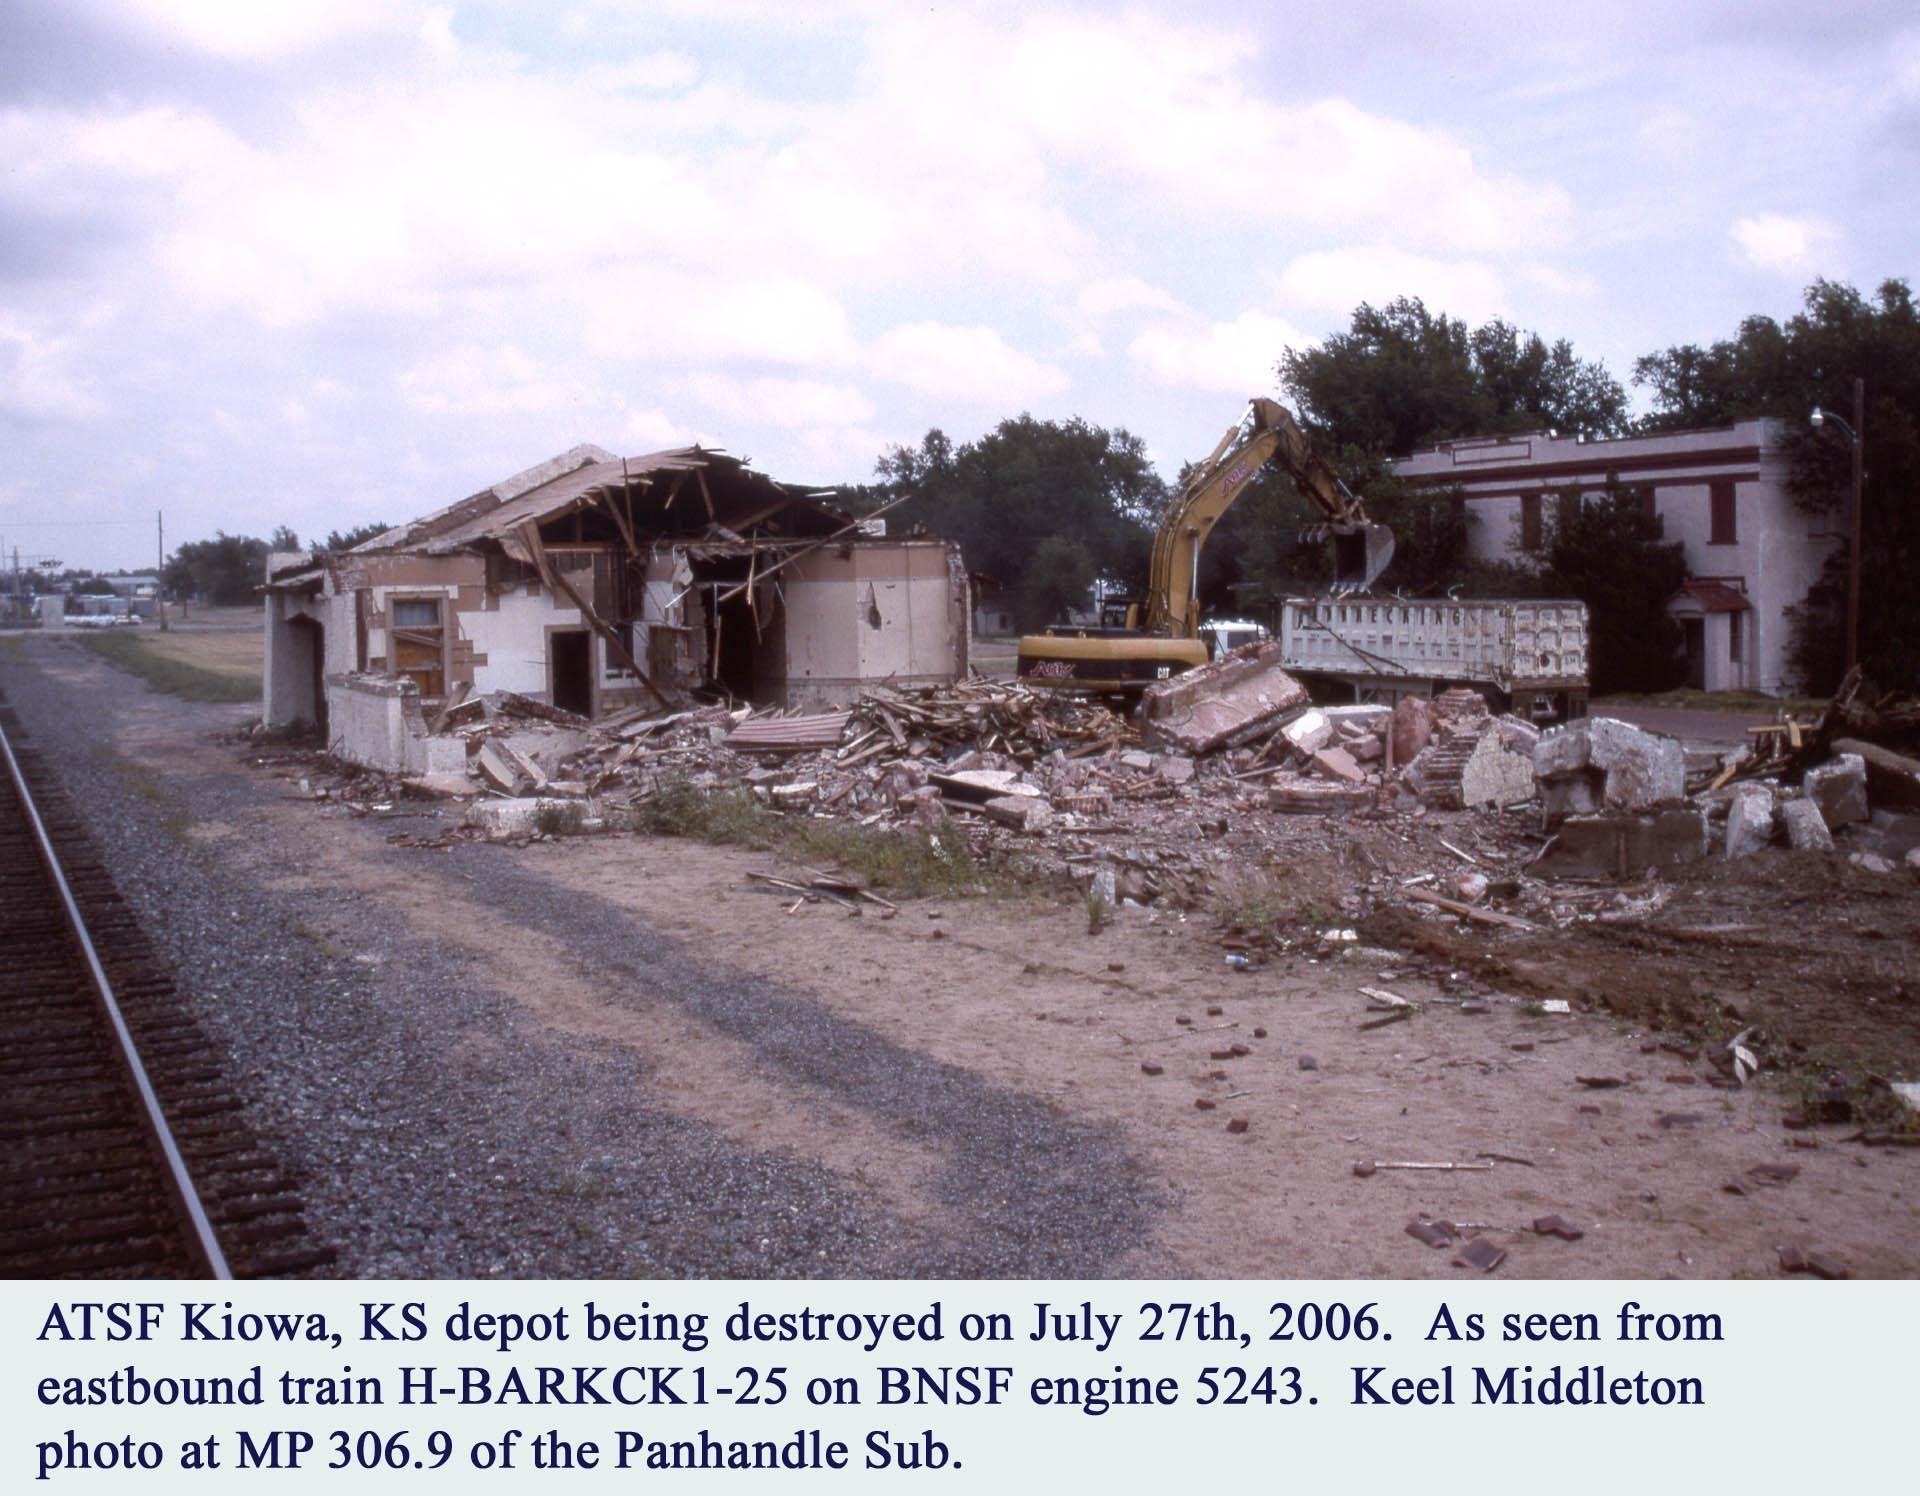 Keel Middleton Rail Related Website Kiowa Depot Kiowa Kansas Photos Depot